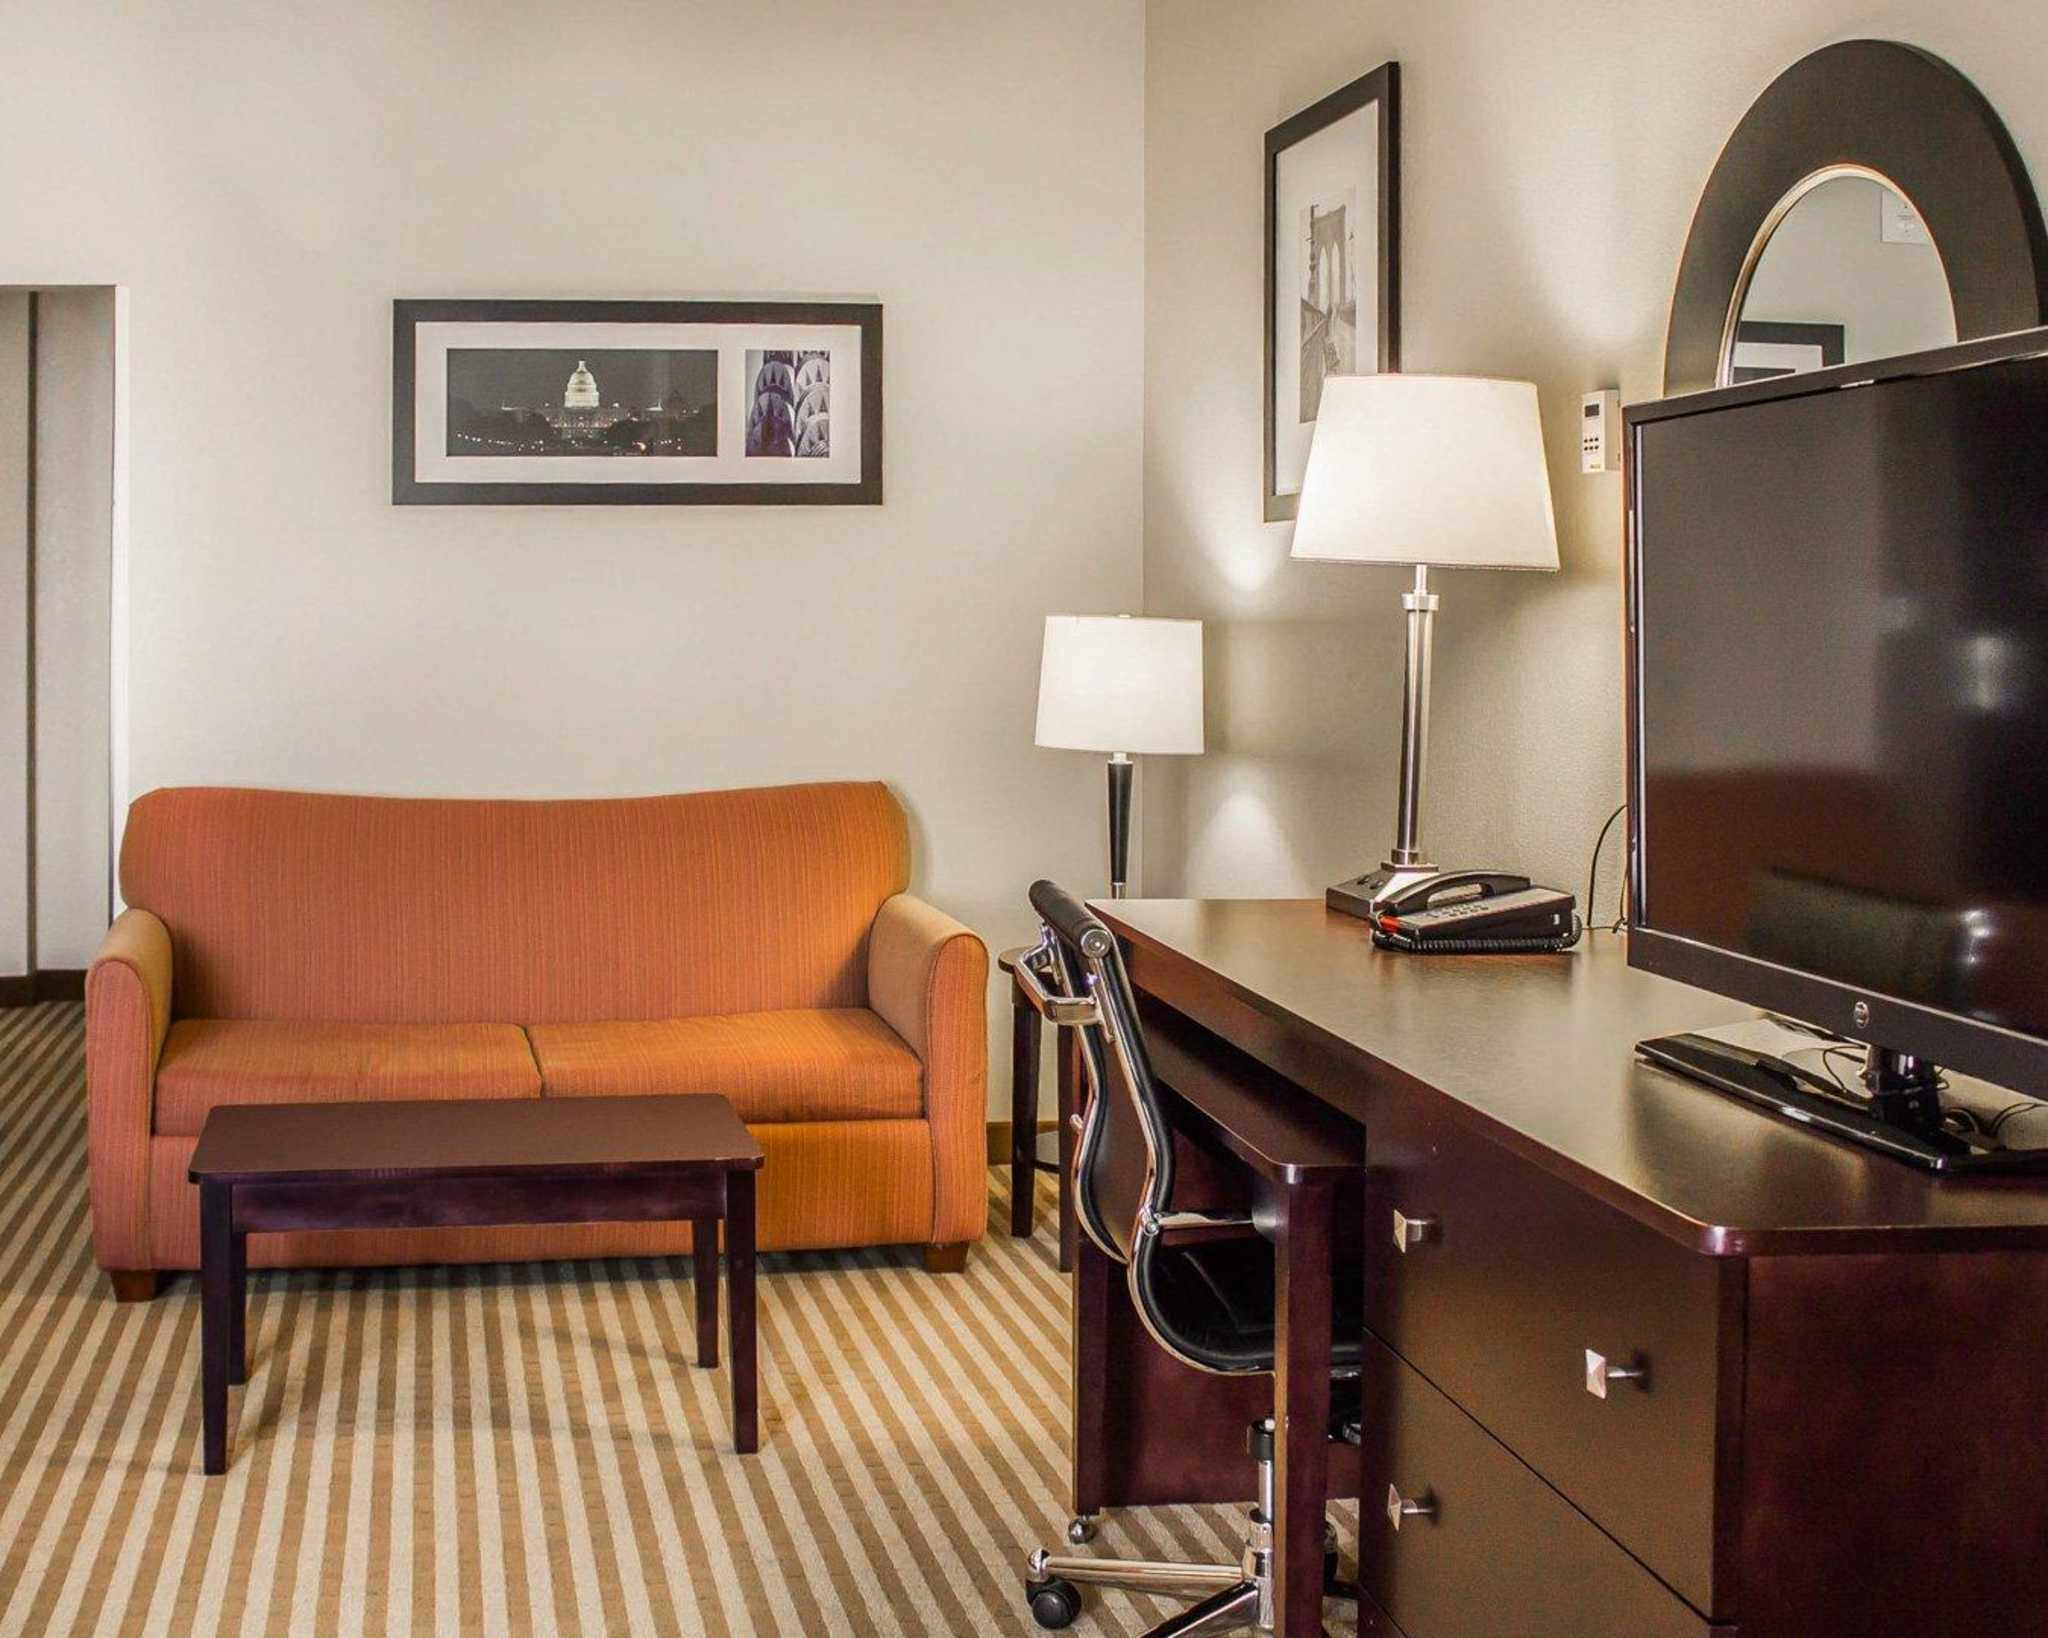 Comfort Suites East Broad at 270 image 15